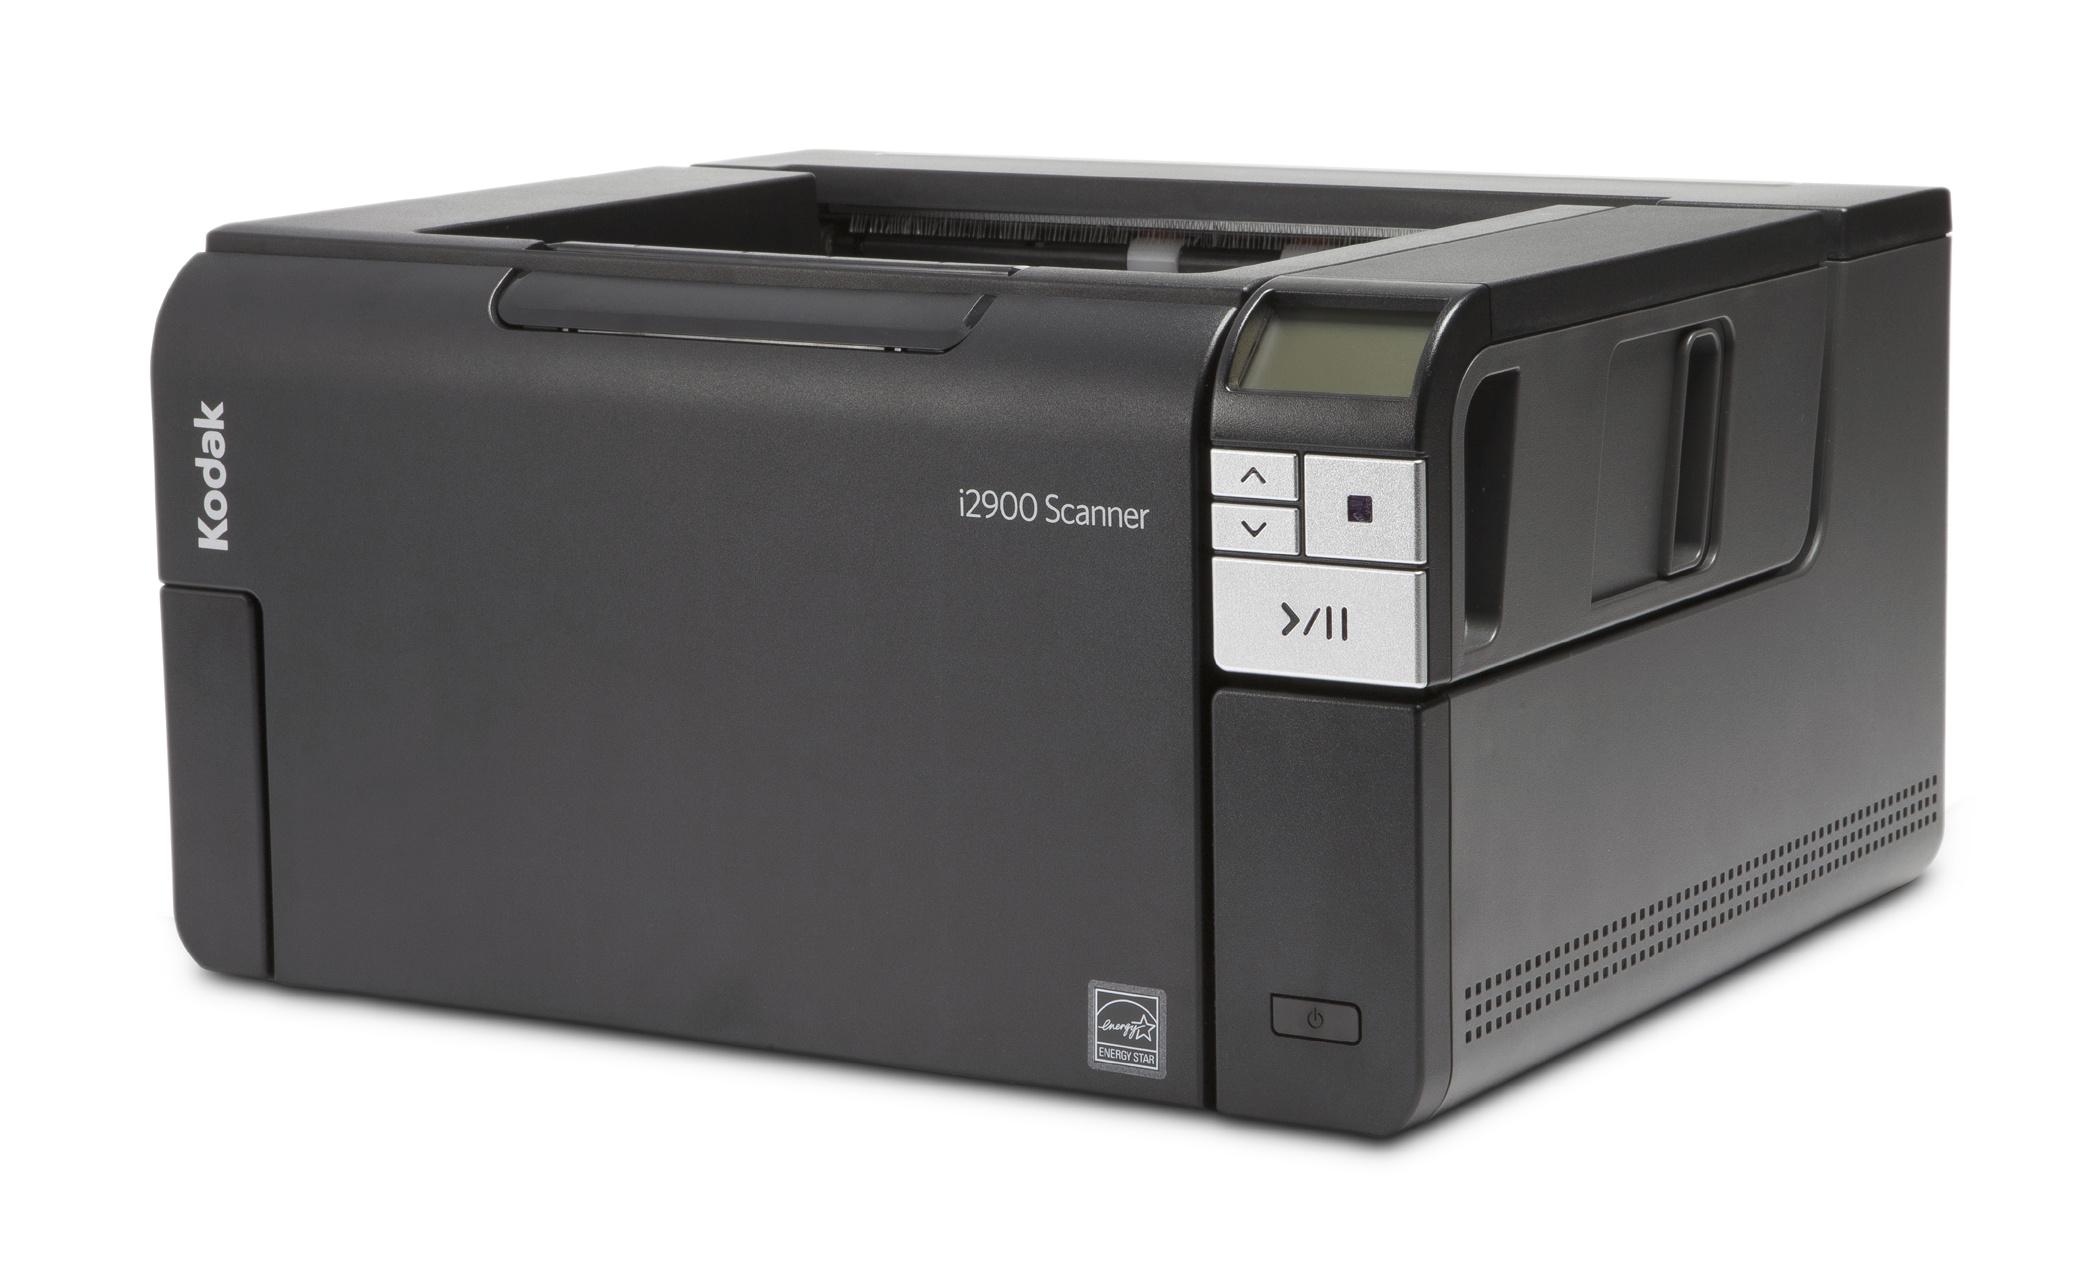 Scanners Kodak Alaris i2900 ADF Scanner